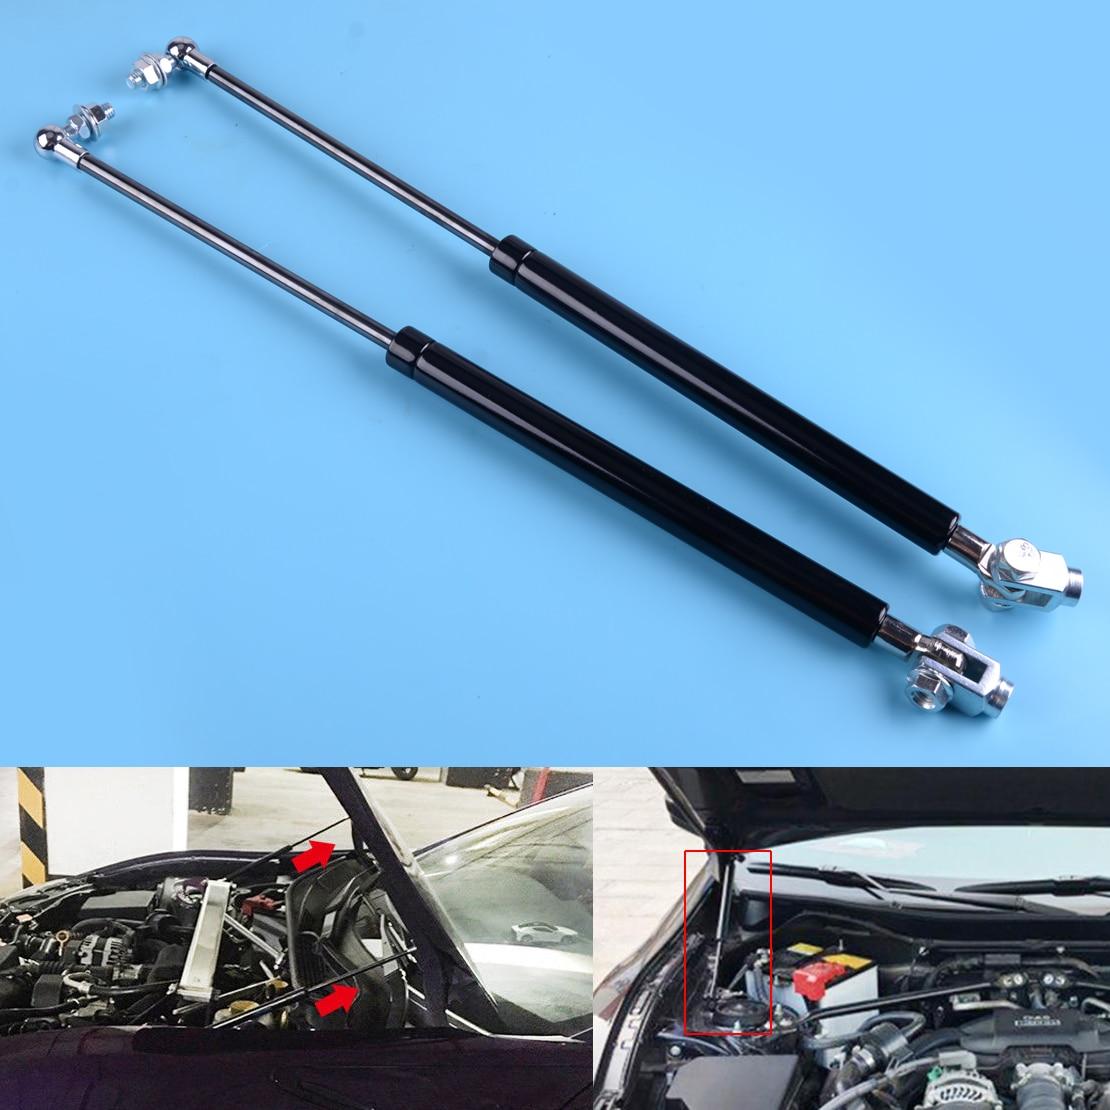 DWCX Auto Stahl Motor Hood Shock Strut Heber Fit für Toyota 86 Subaru BRZ 2013 2014 2015 2016 2017